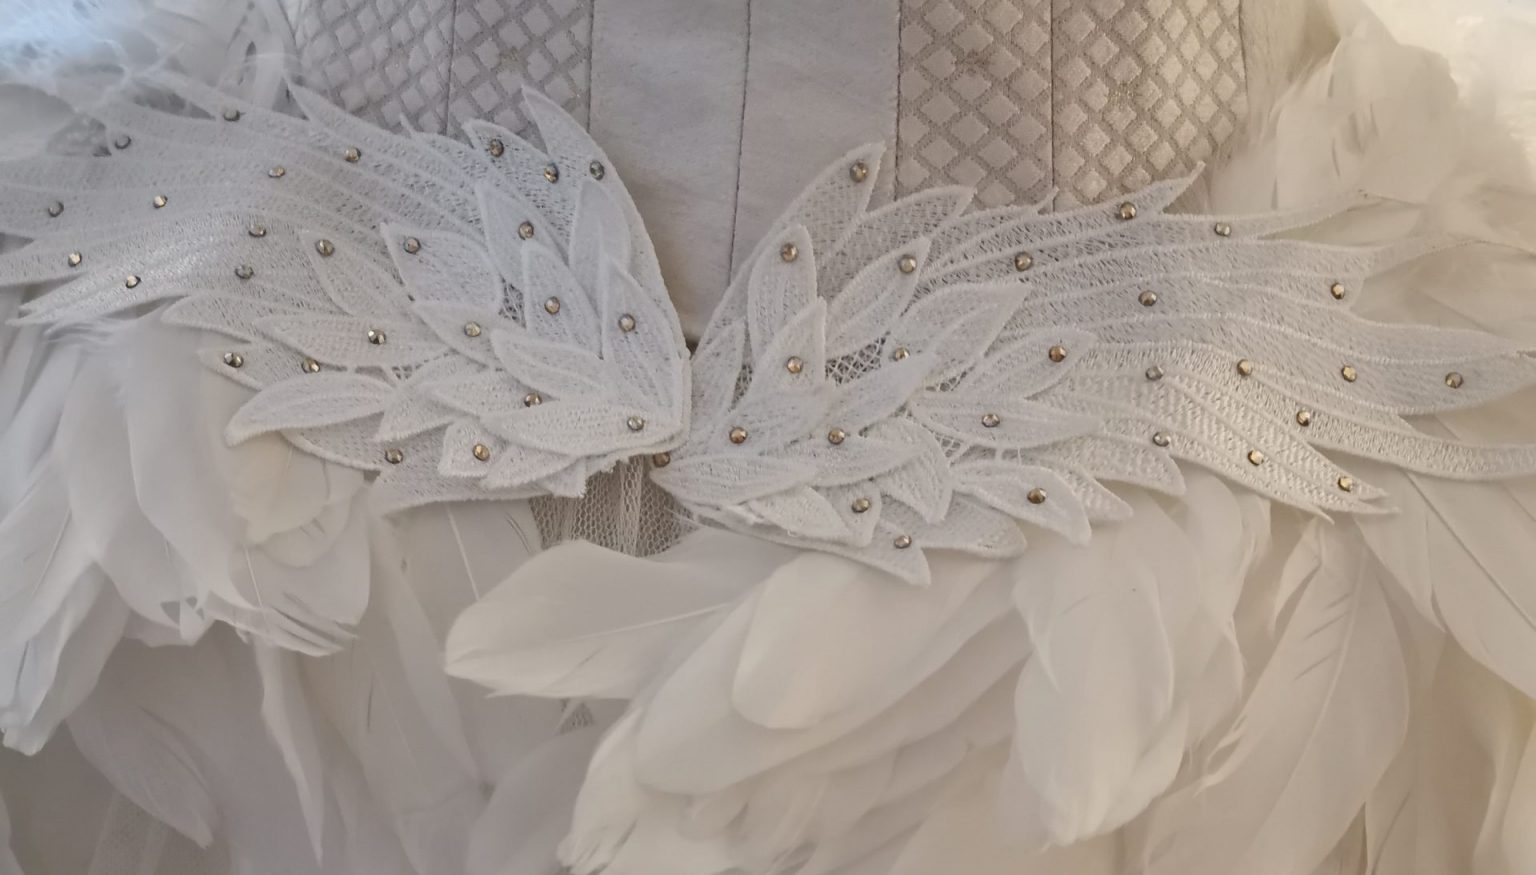 Tutu with white feathers